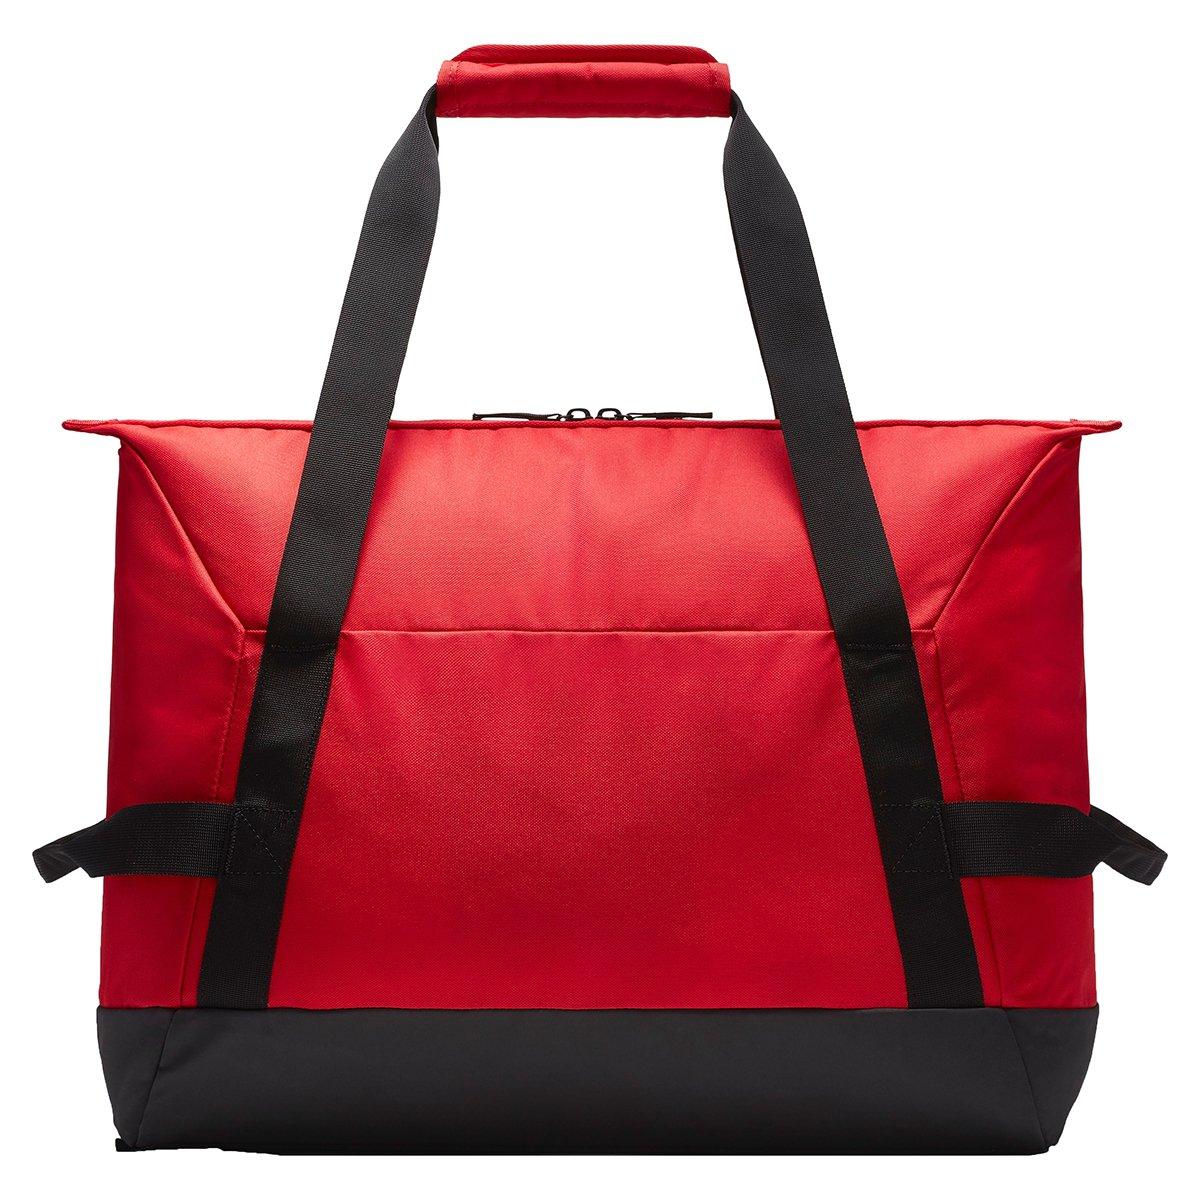 b91ba1cf0151 Nike Unisex s NK ACDMY TEAM S DUFF Gym Bag